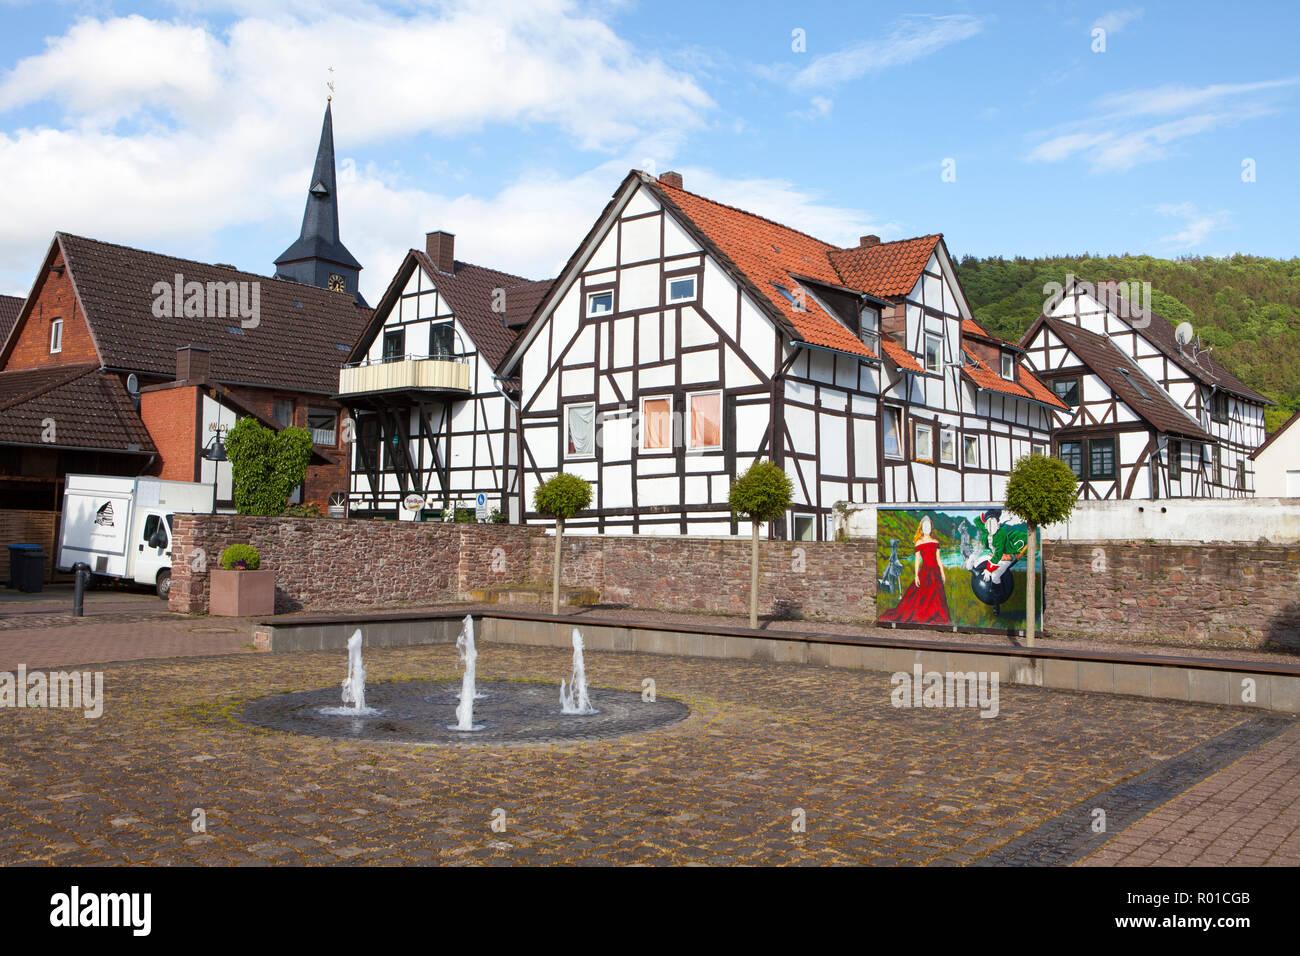 Paisaje urbano de Bodenwerder, cuna del Barón Muenchhausen, Weserbergland, Baja Sajonia, Alemania, Europa Foto de stock